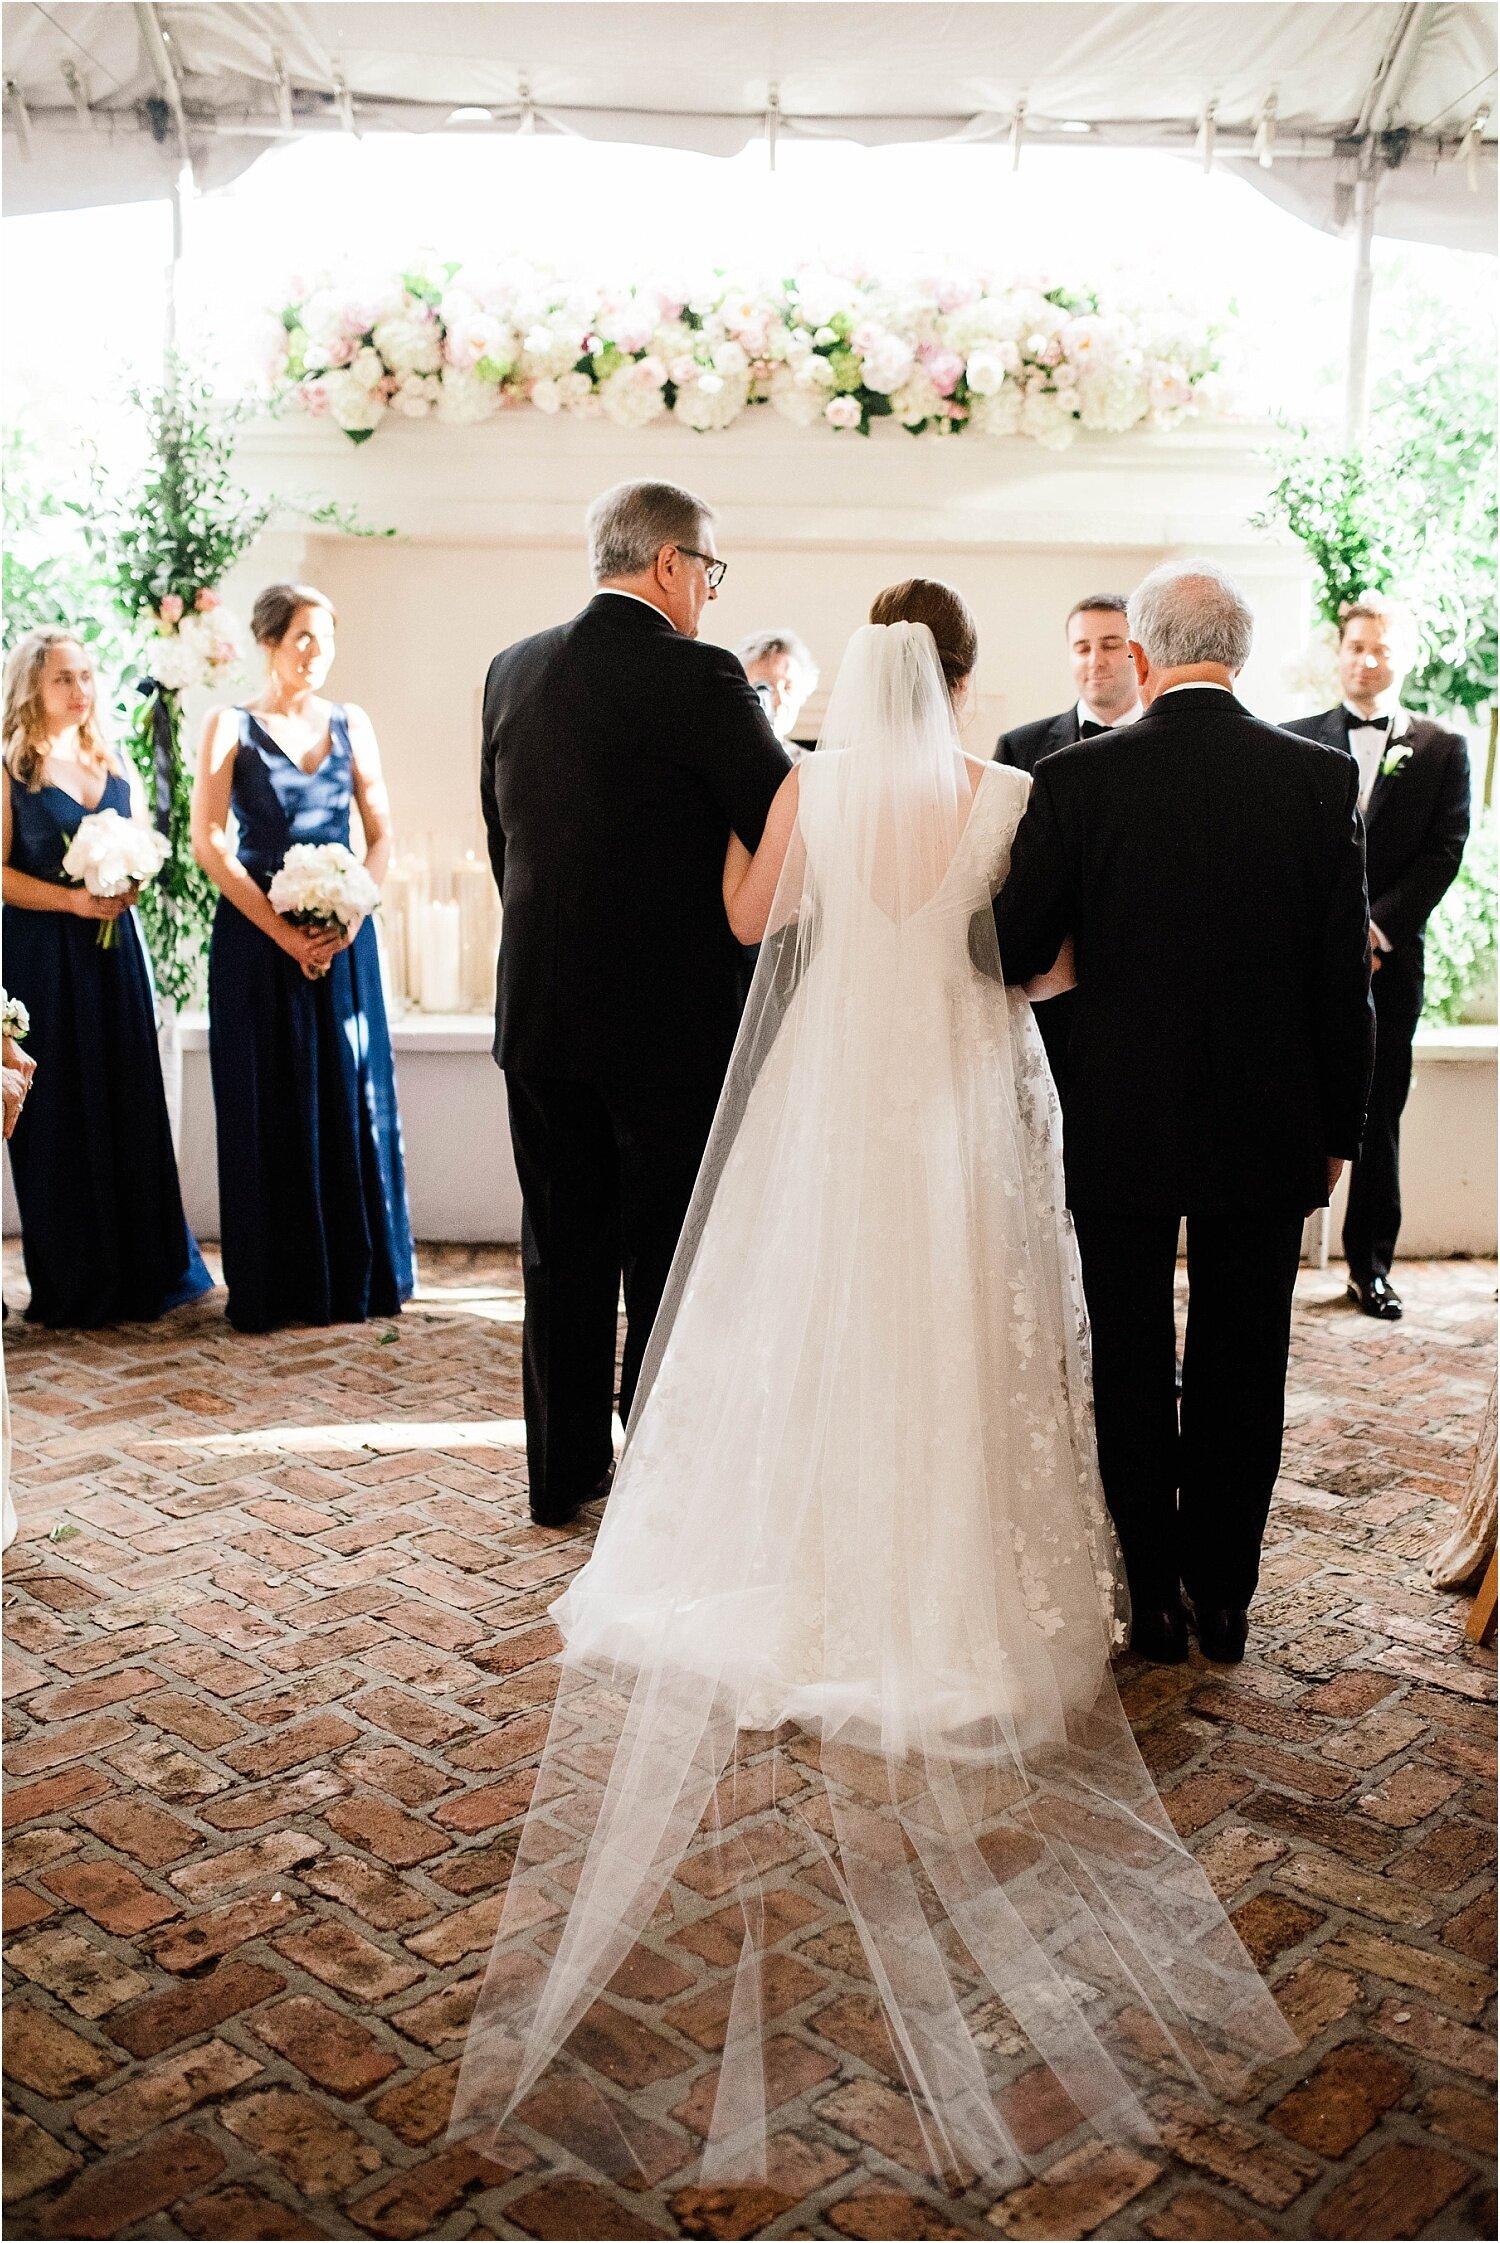 Maitland + Alex-Il-Mercato-New-Orleans-Wedding_Gabby Chapin Photography_026.jpg